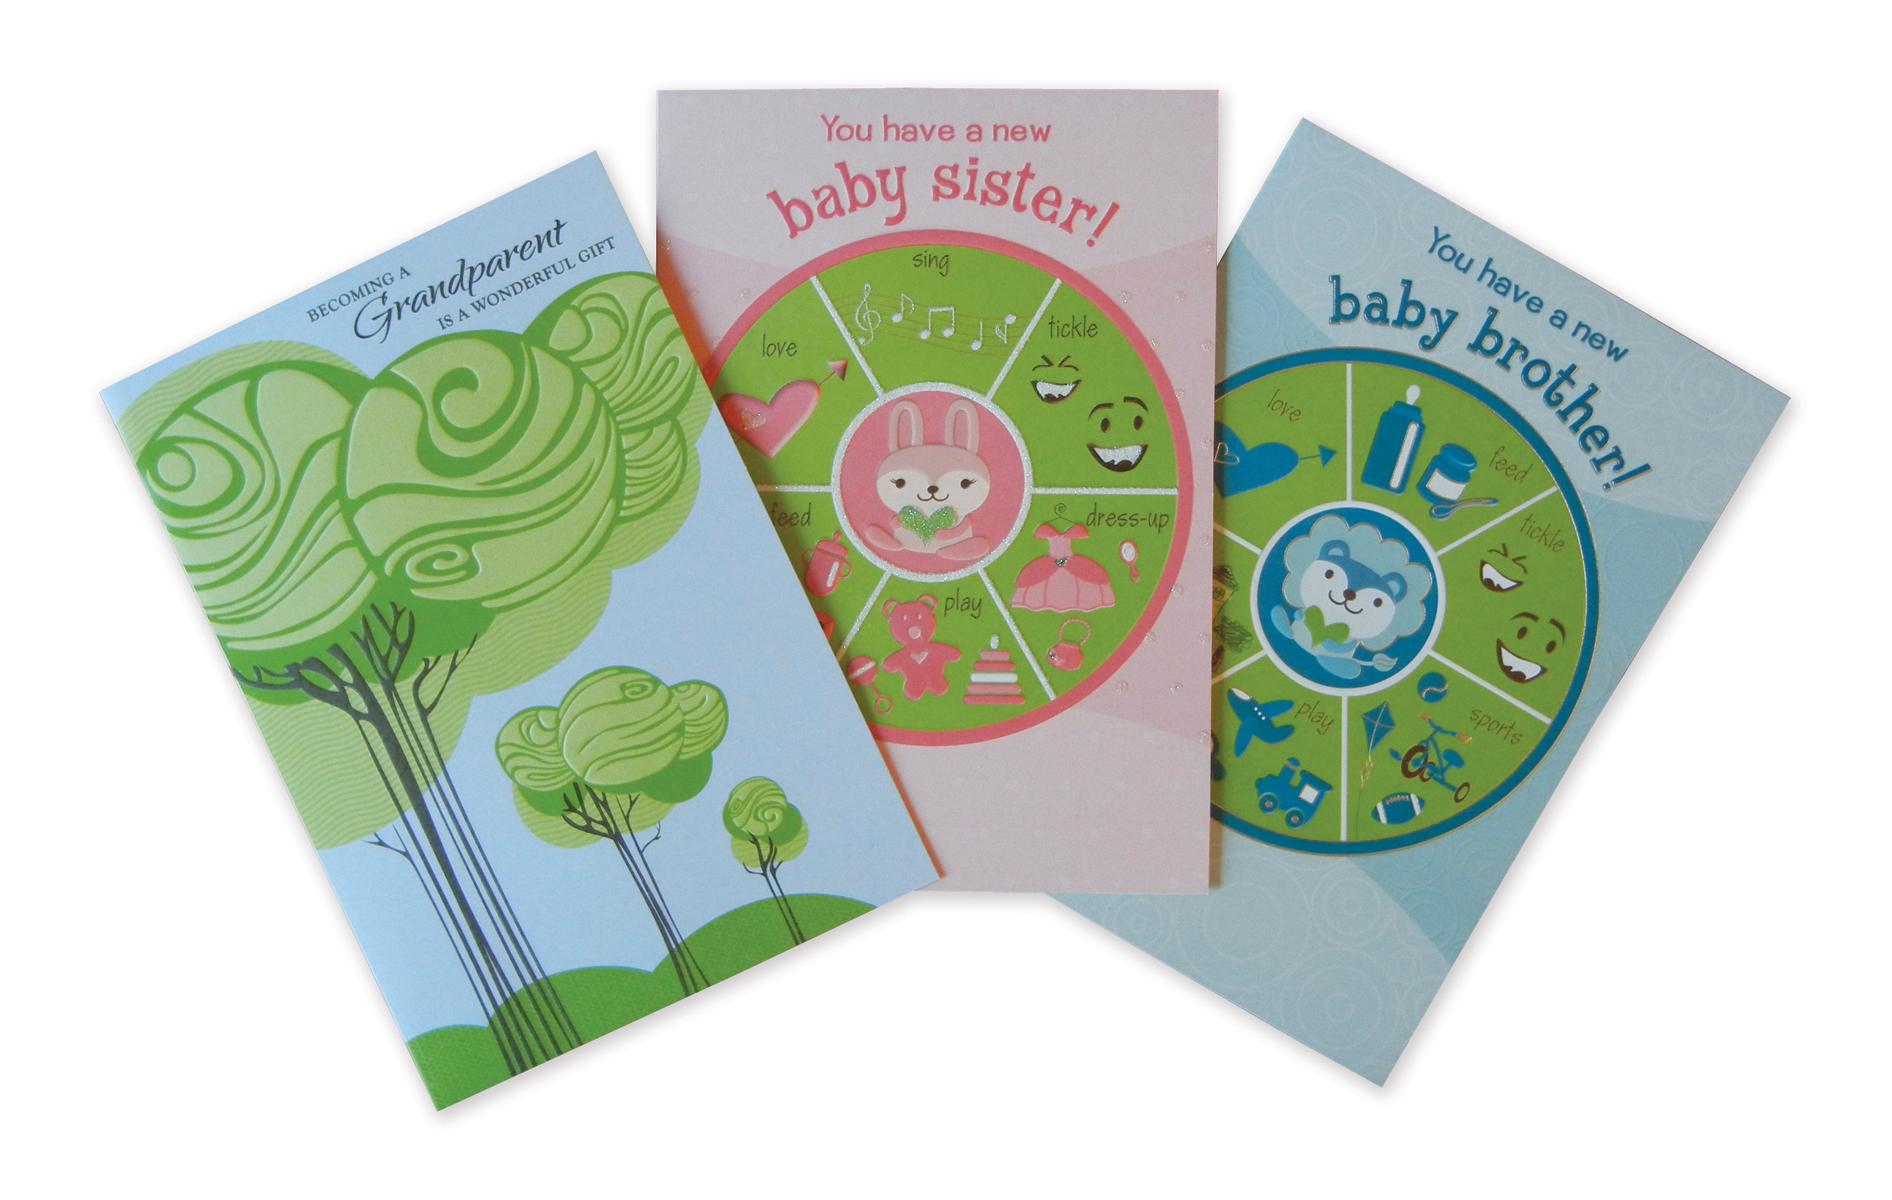 Child theme_3 cards_LR.jpg